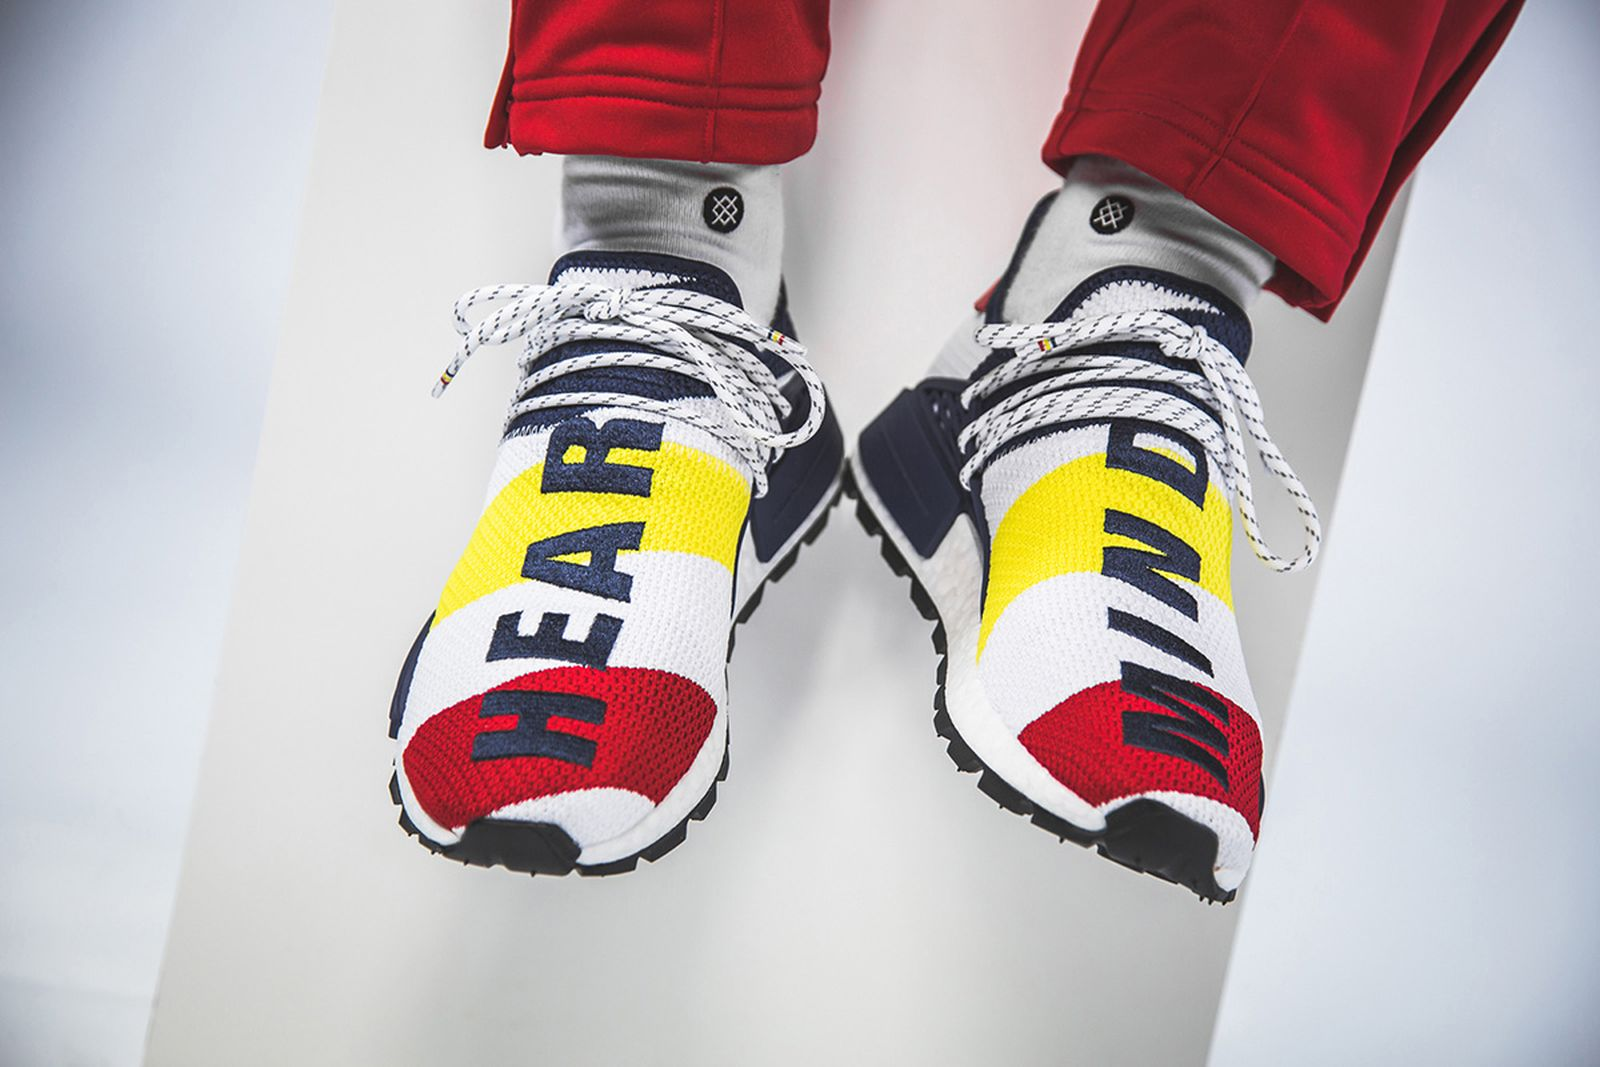 billionaire boys club pharrell williams adidas heart mind release date price adidas Originals